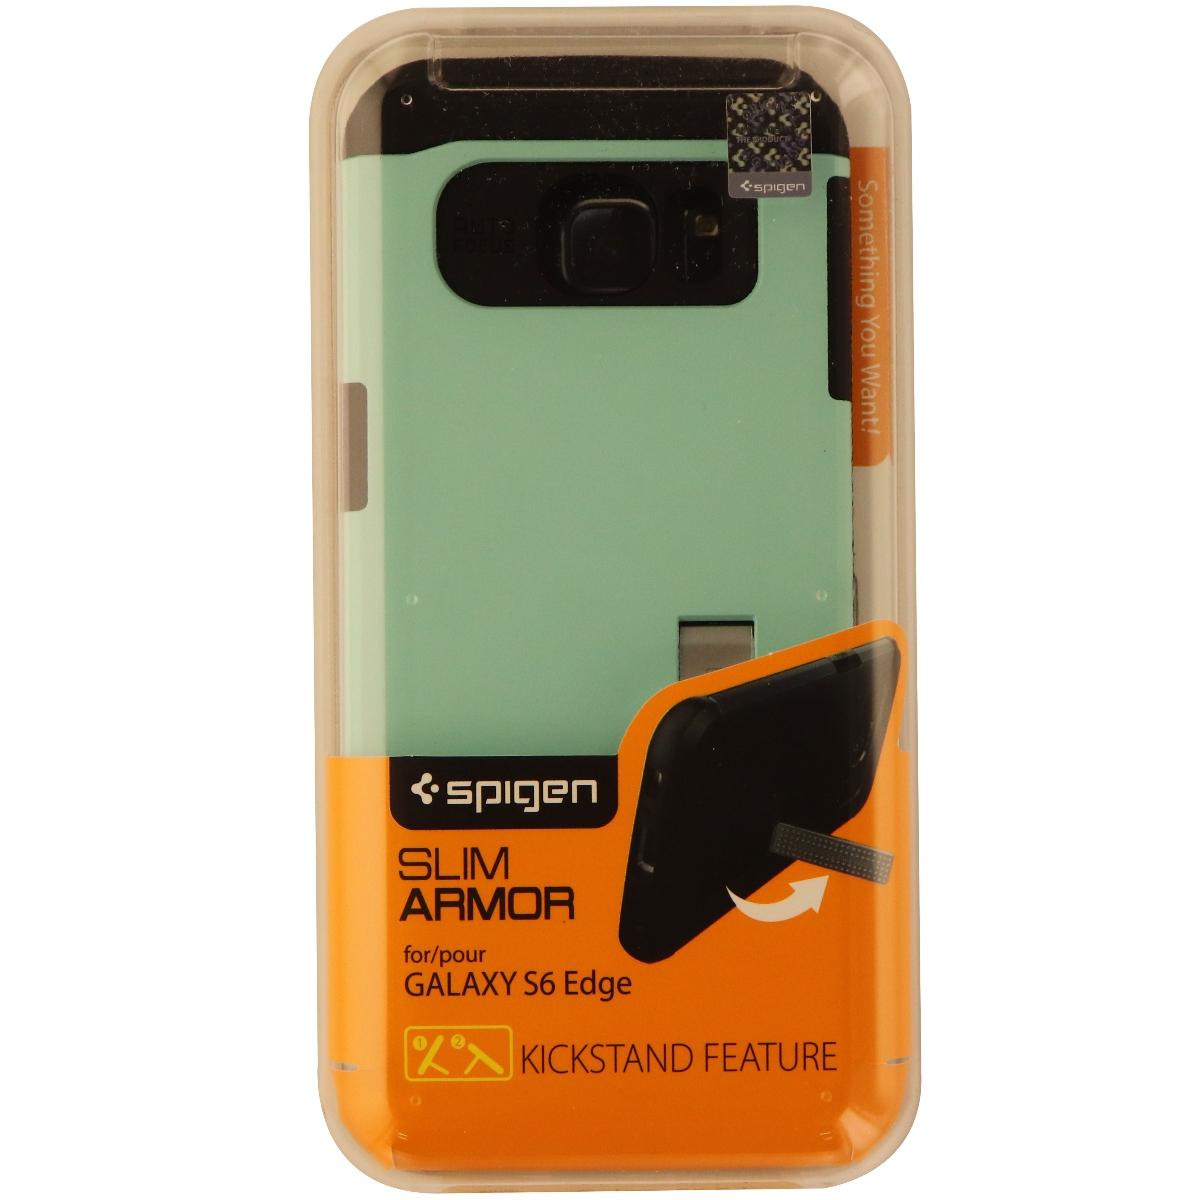 Spigen Slim Armor CS Series Dual Layer Hard Case for Galaxy S6 Edge - Teal/Black